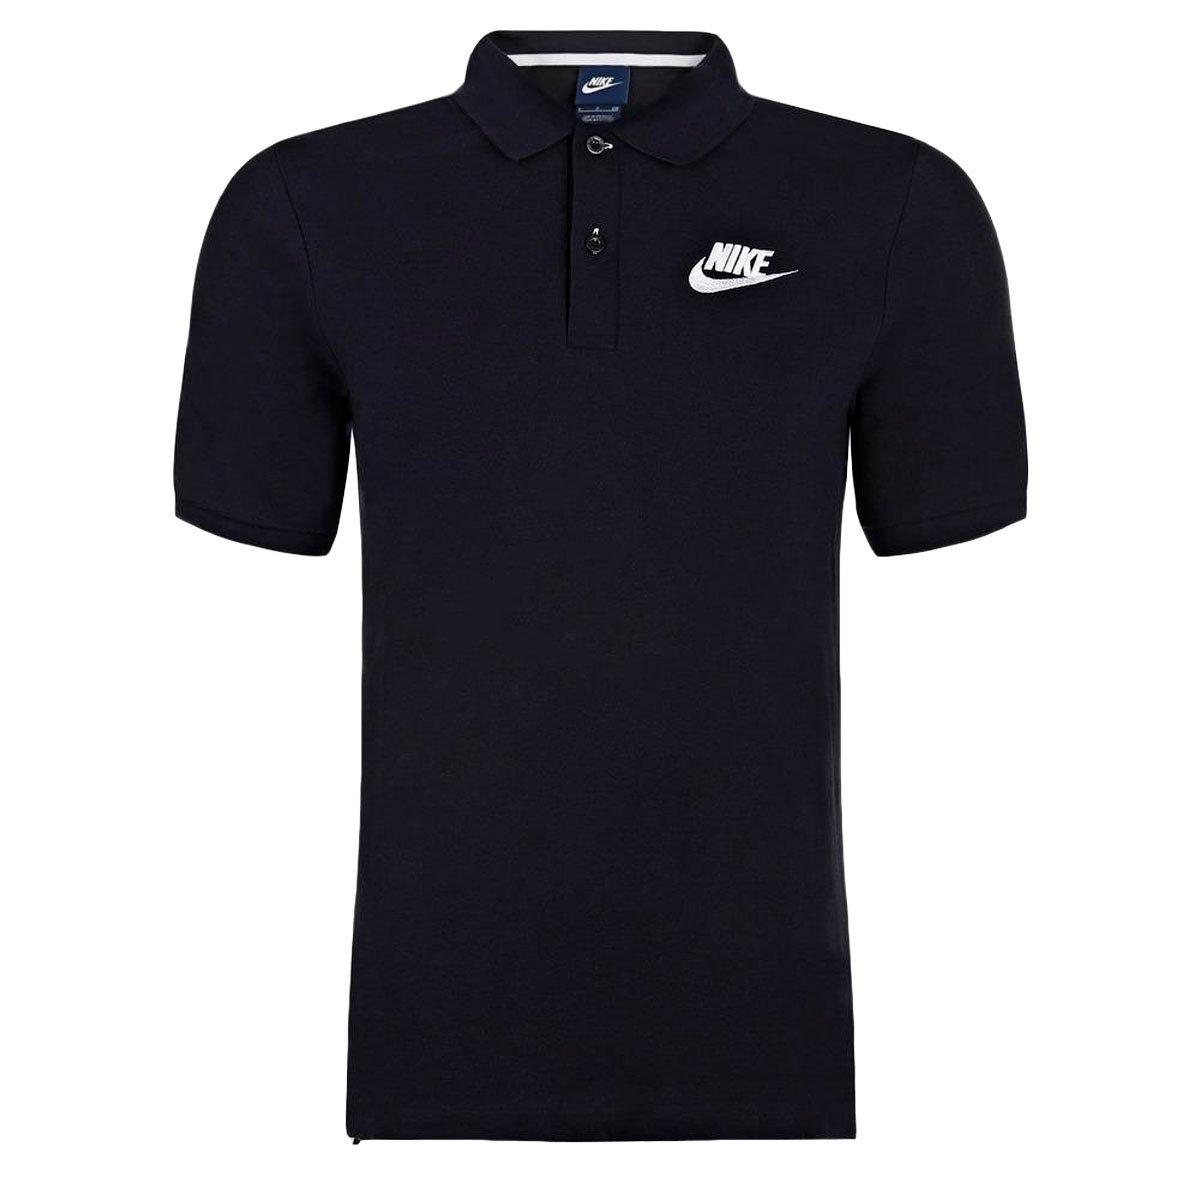 Bizz Store - Camisa Polo Masculina Nike NSW Manga Curta 8a7d0f79b71